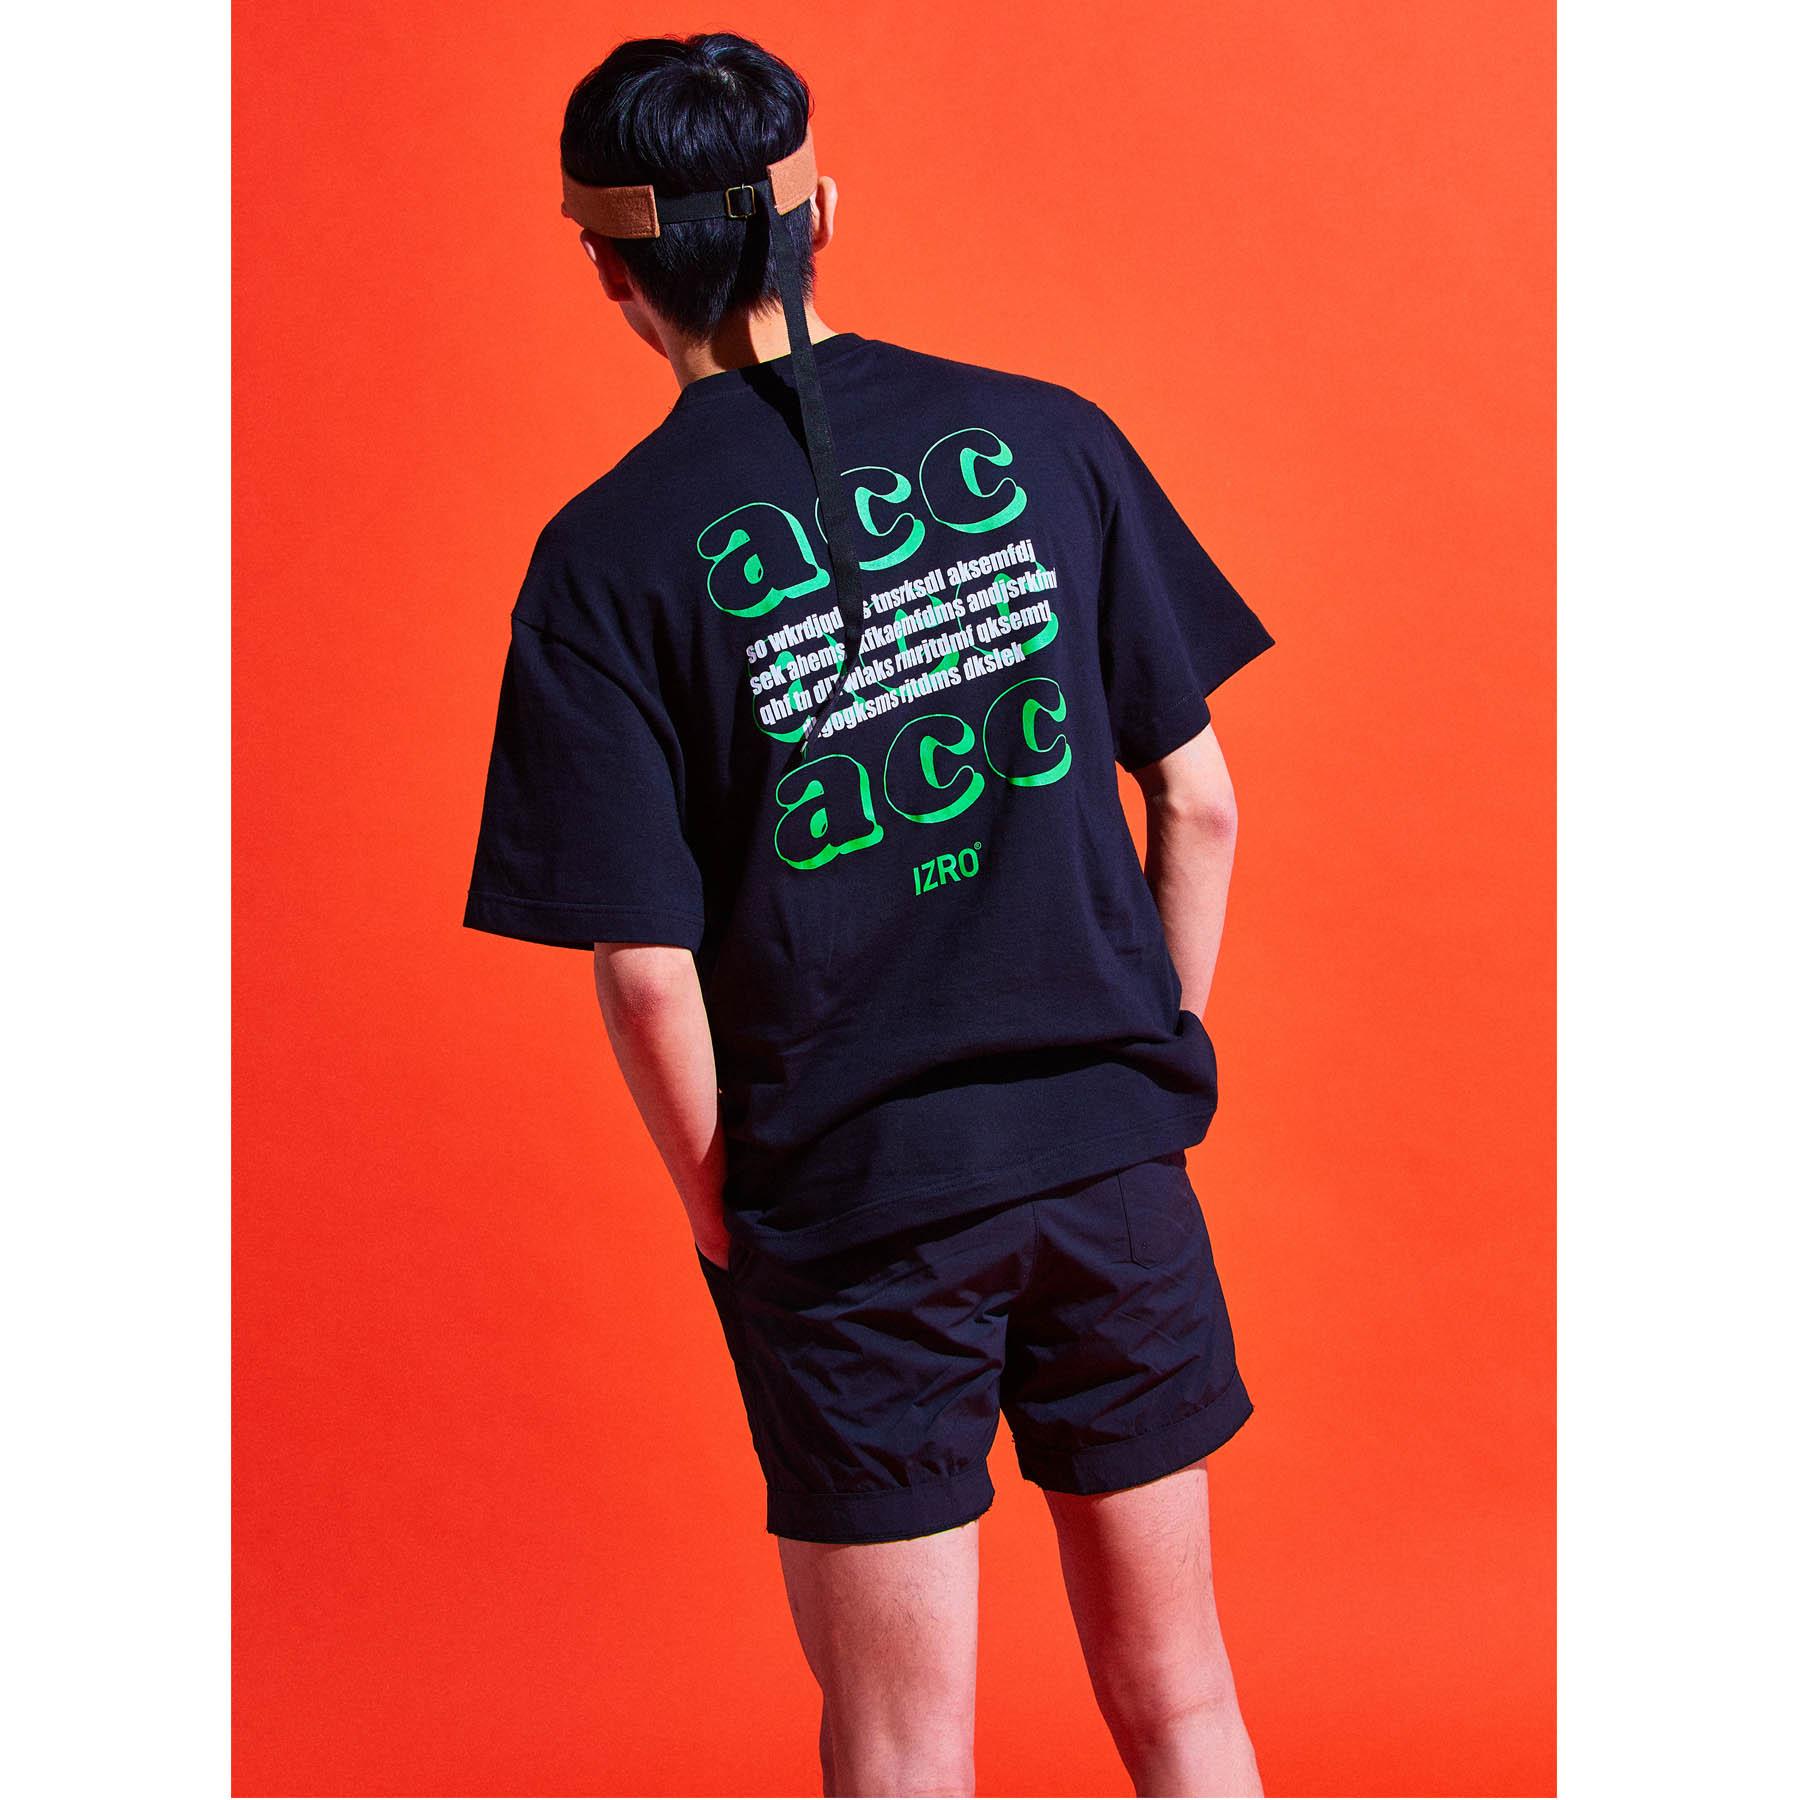 IZRO ACC T-SHIRTS - BLACK